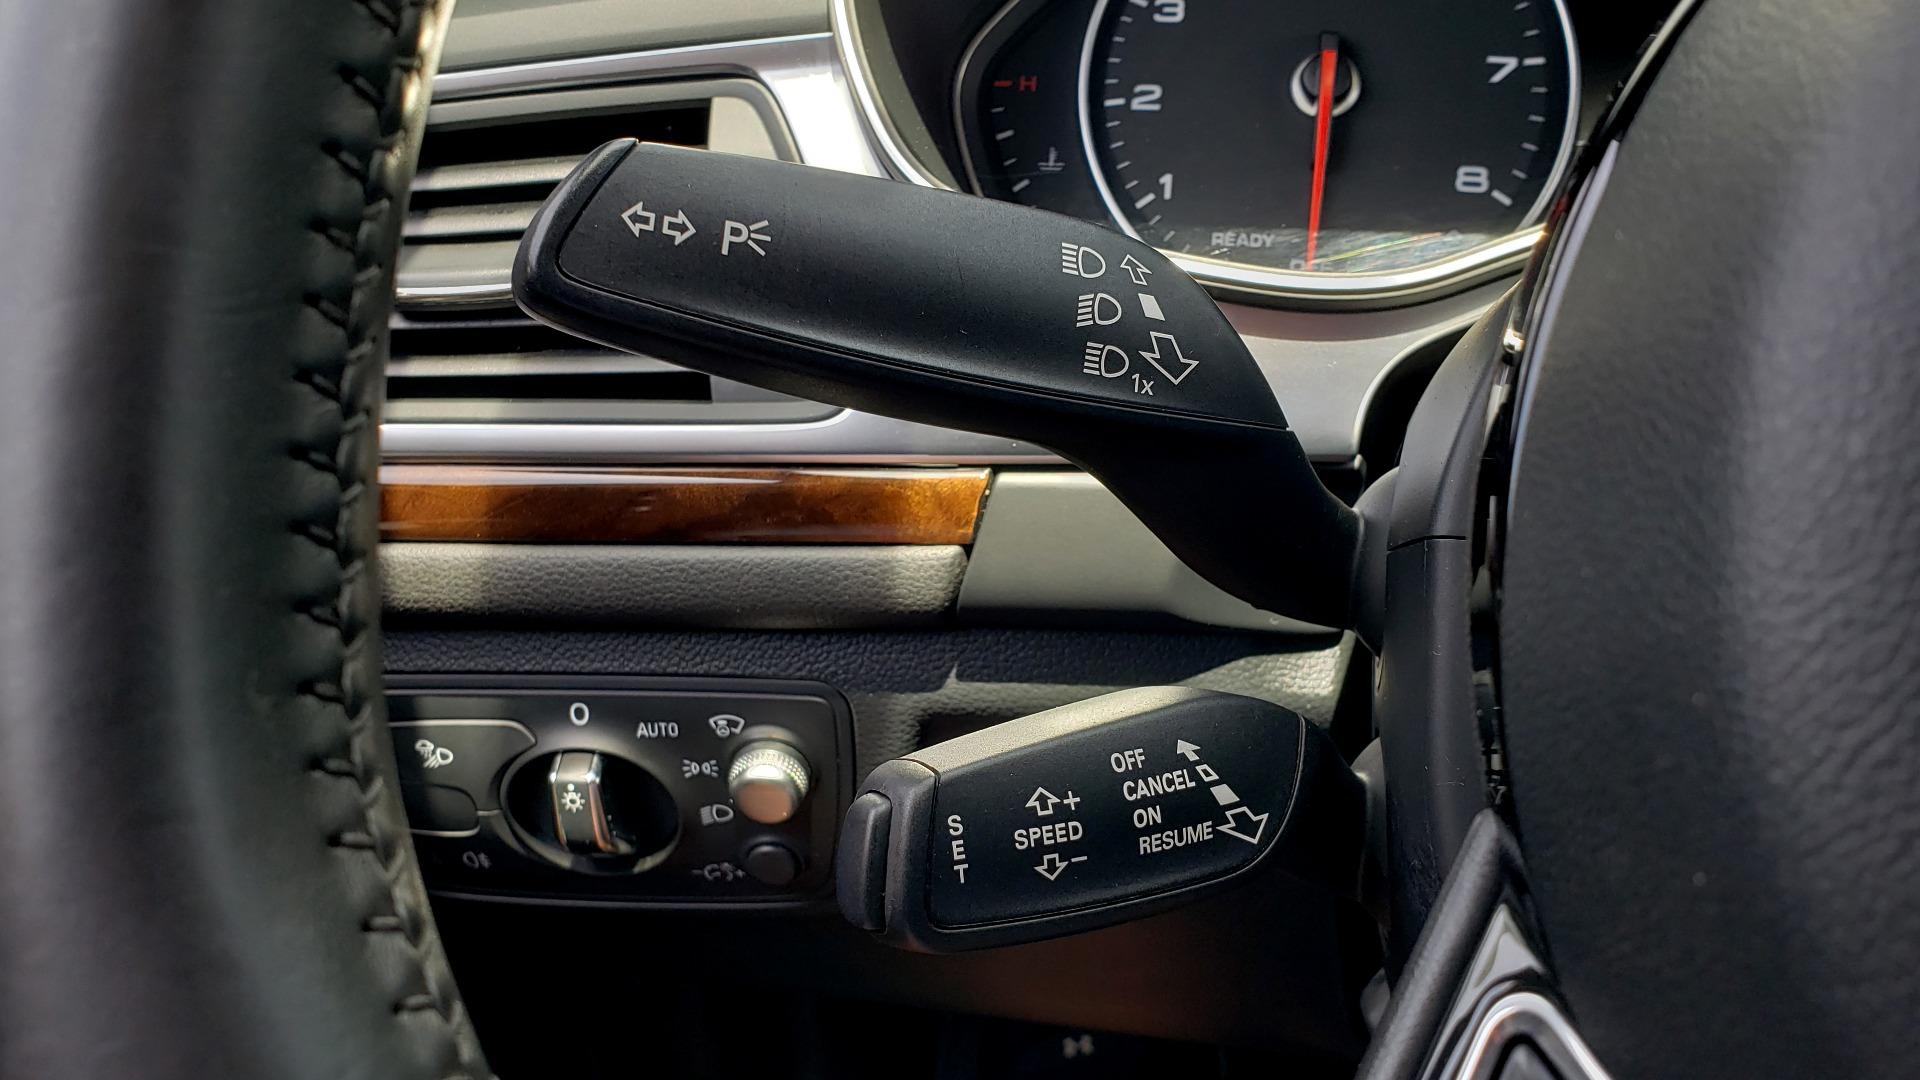 Used 2017 Audi A6 PRESTIGE SEDAN 3.0T / NAV / SUNROOF / BLACK OPTIC / CLD WTHR / REARVIEW for sale $30,797 at Formula Imports in Charlotte NC 28227 42